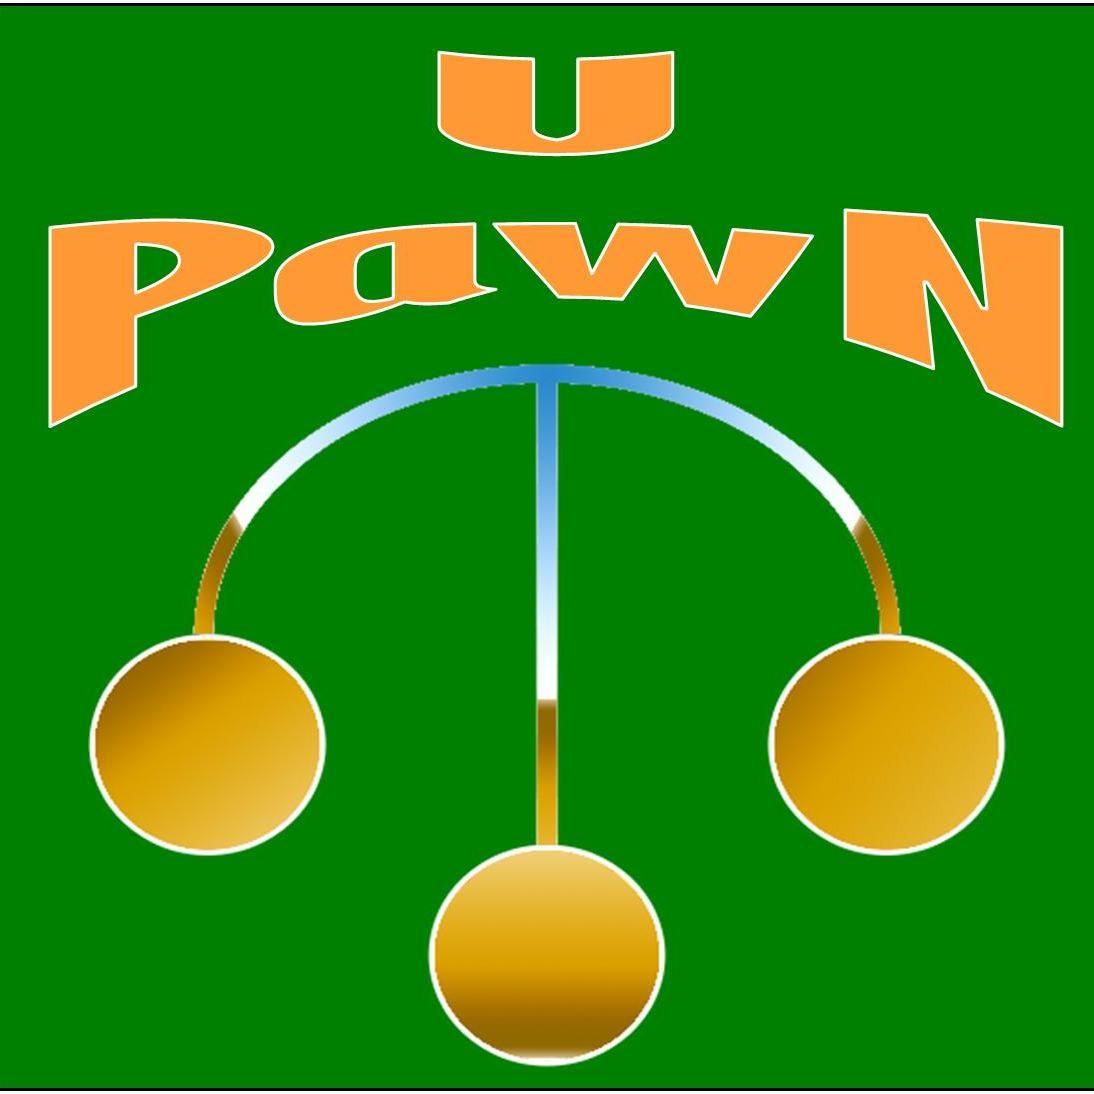 Upawn